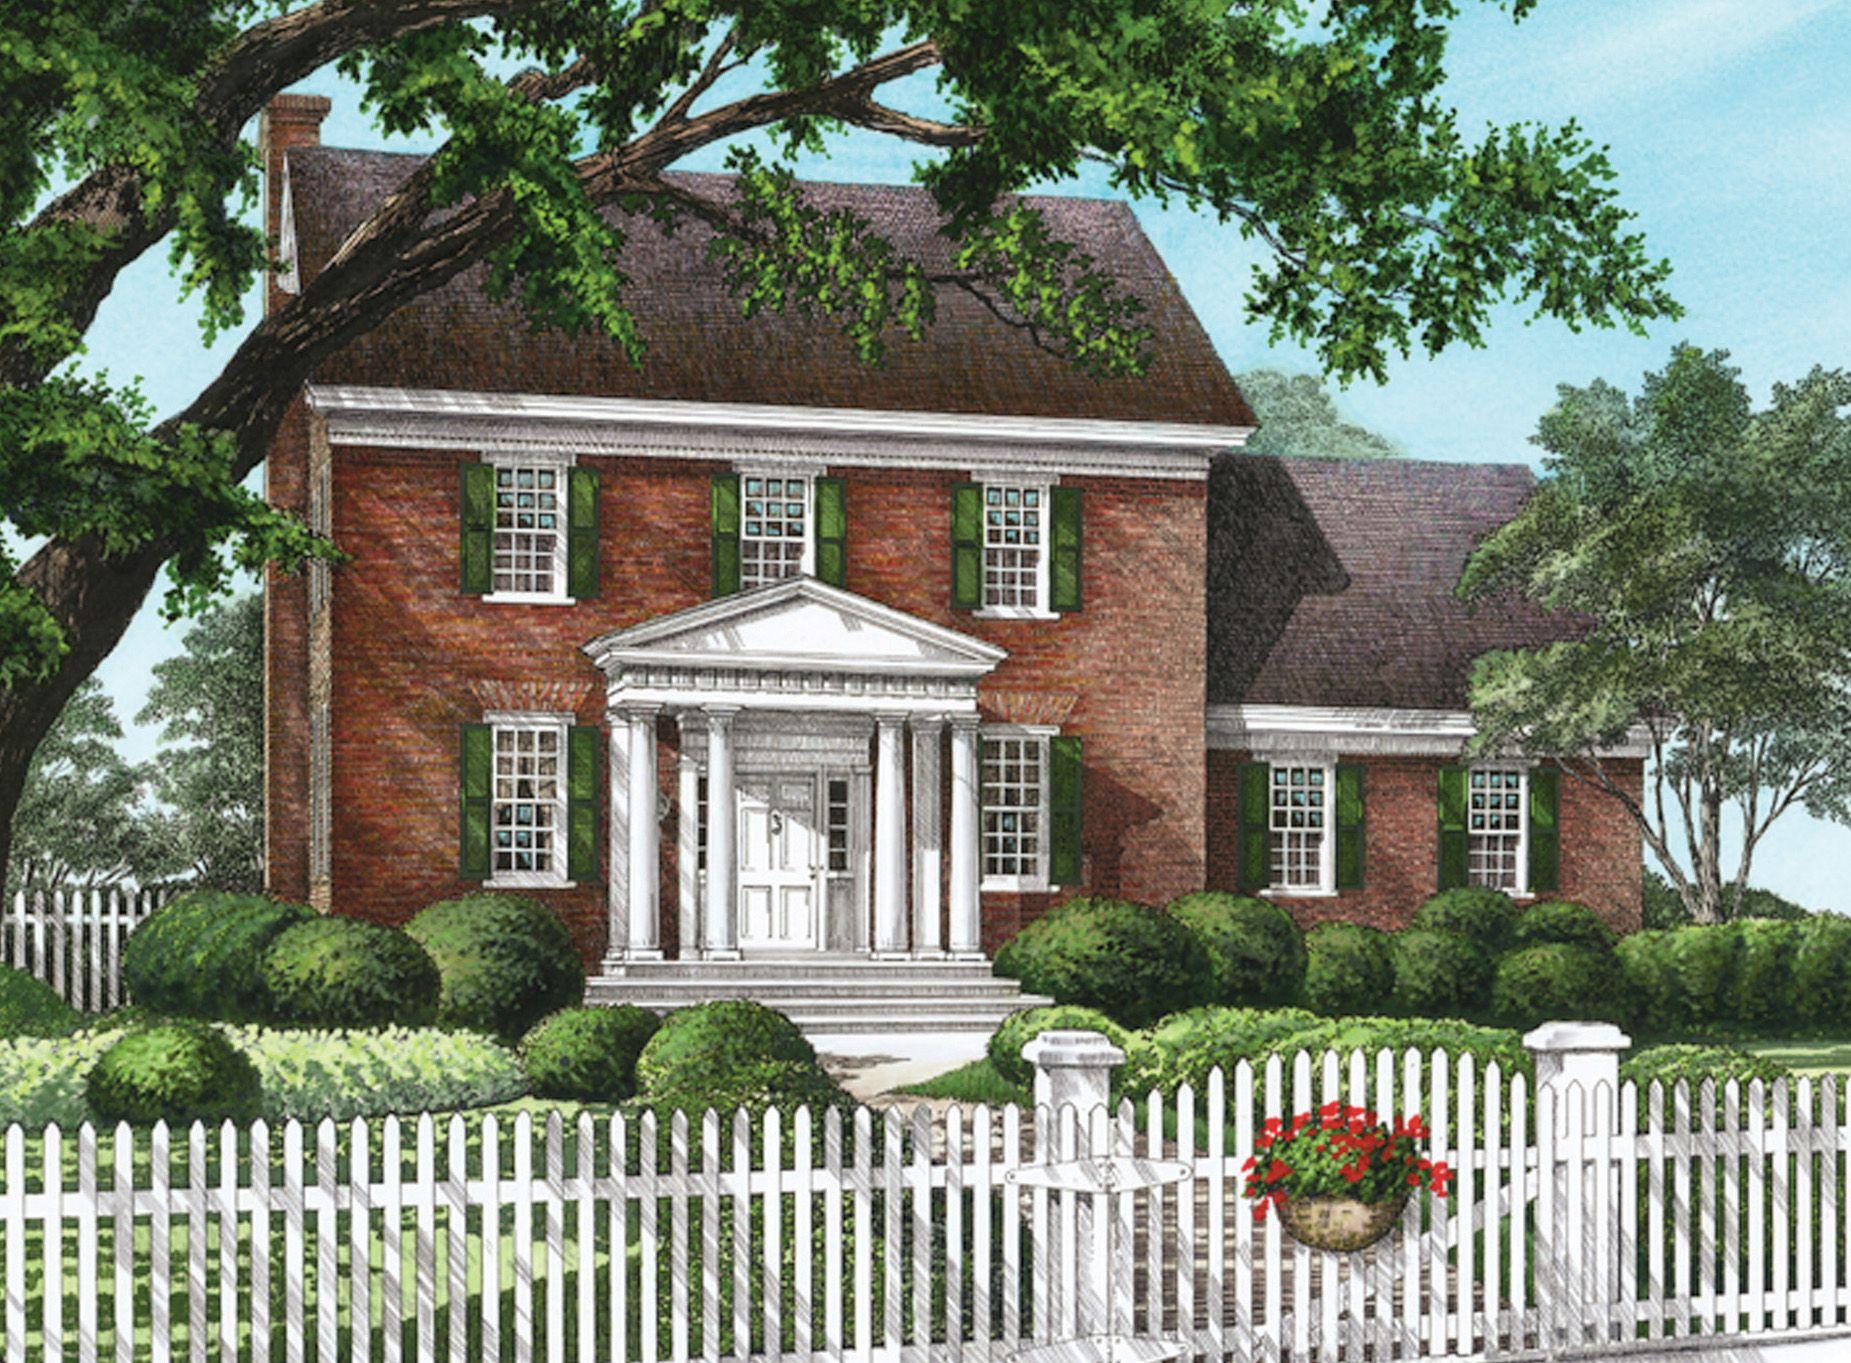 Plan 32563wp Classic Colonial Home Plan Brick Exterior House Colonial House Plans Colonial House